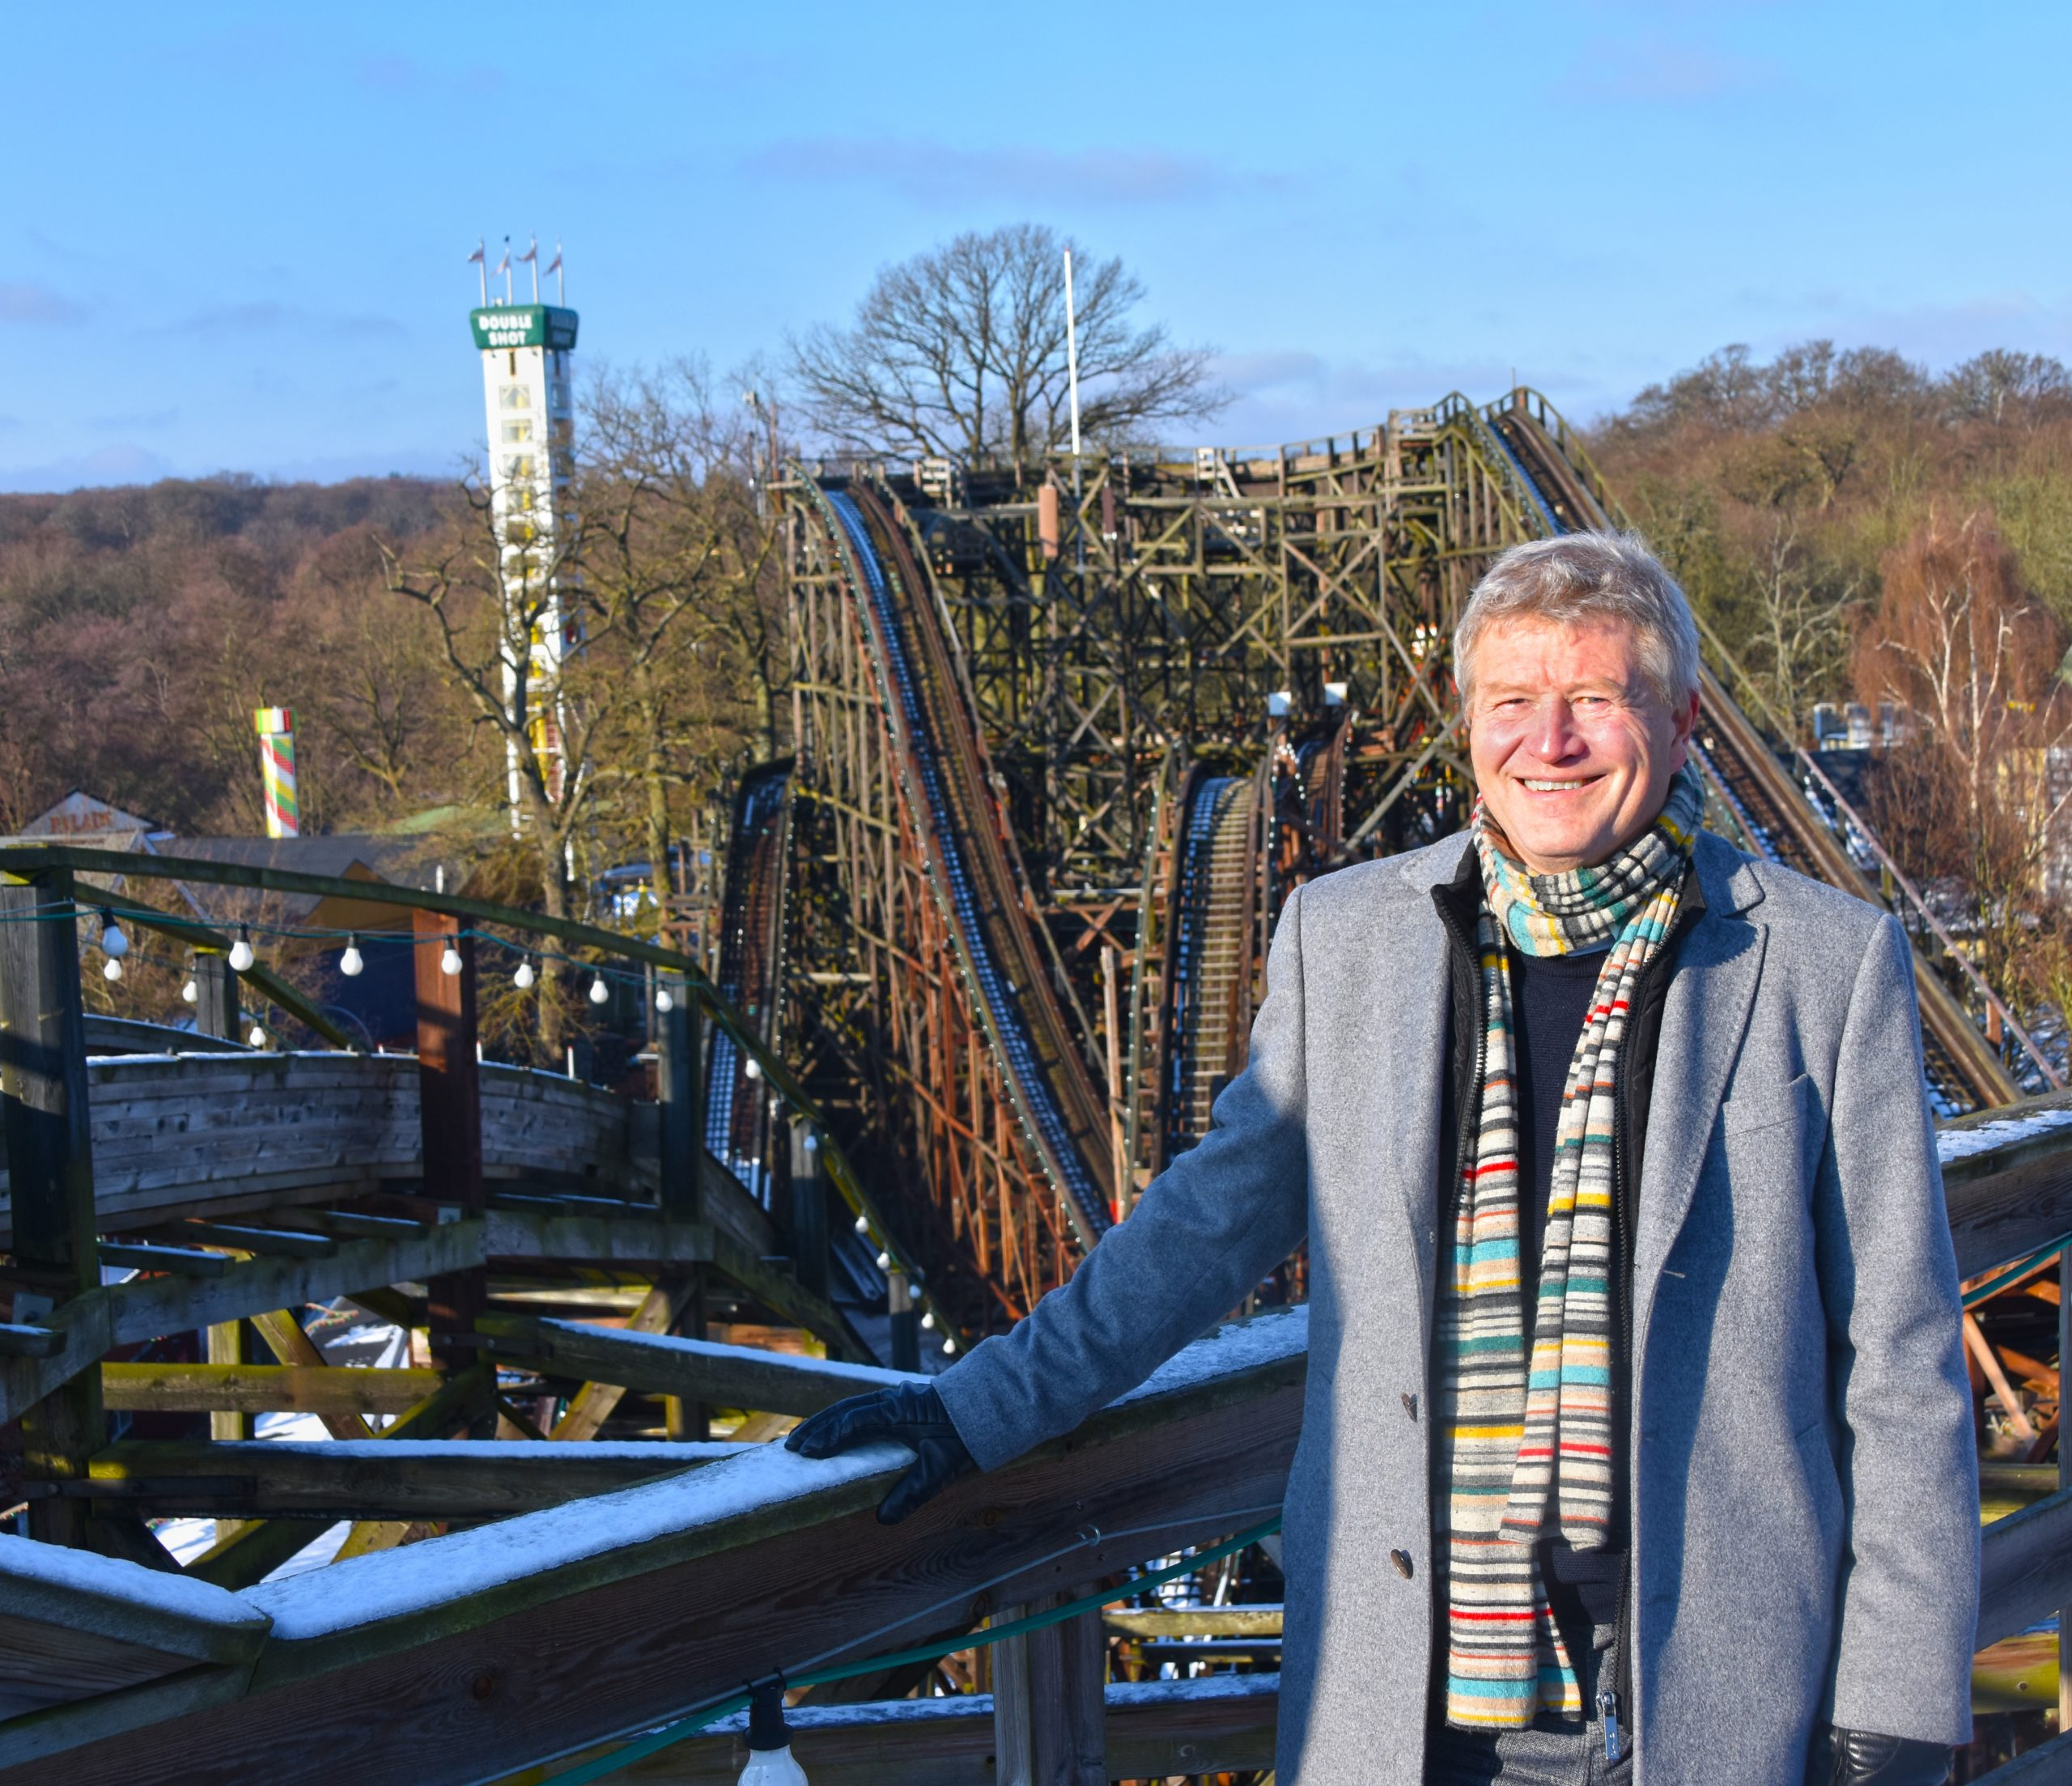 Ole Andersen begyndte 1. februar som ny administrerende direktør for Dyrehavsbakken, der har 32 kørende forlystelser, og blandt andet er hjemsted for Cirkusrevyen. PR-foto: Dyrehavsbakken.